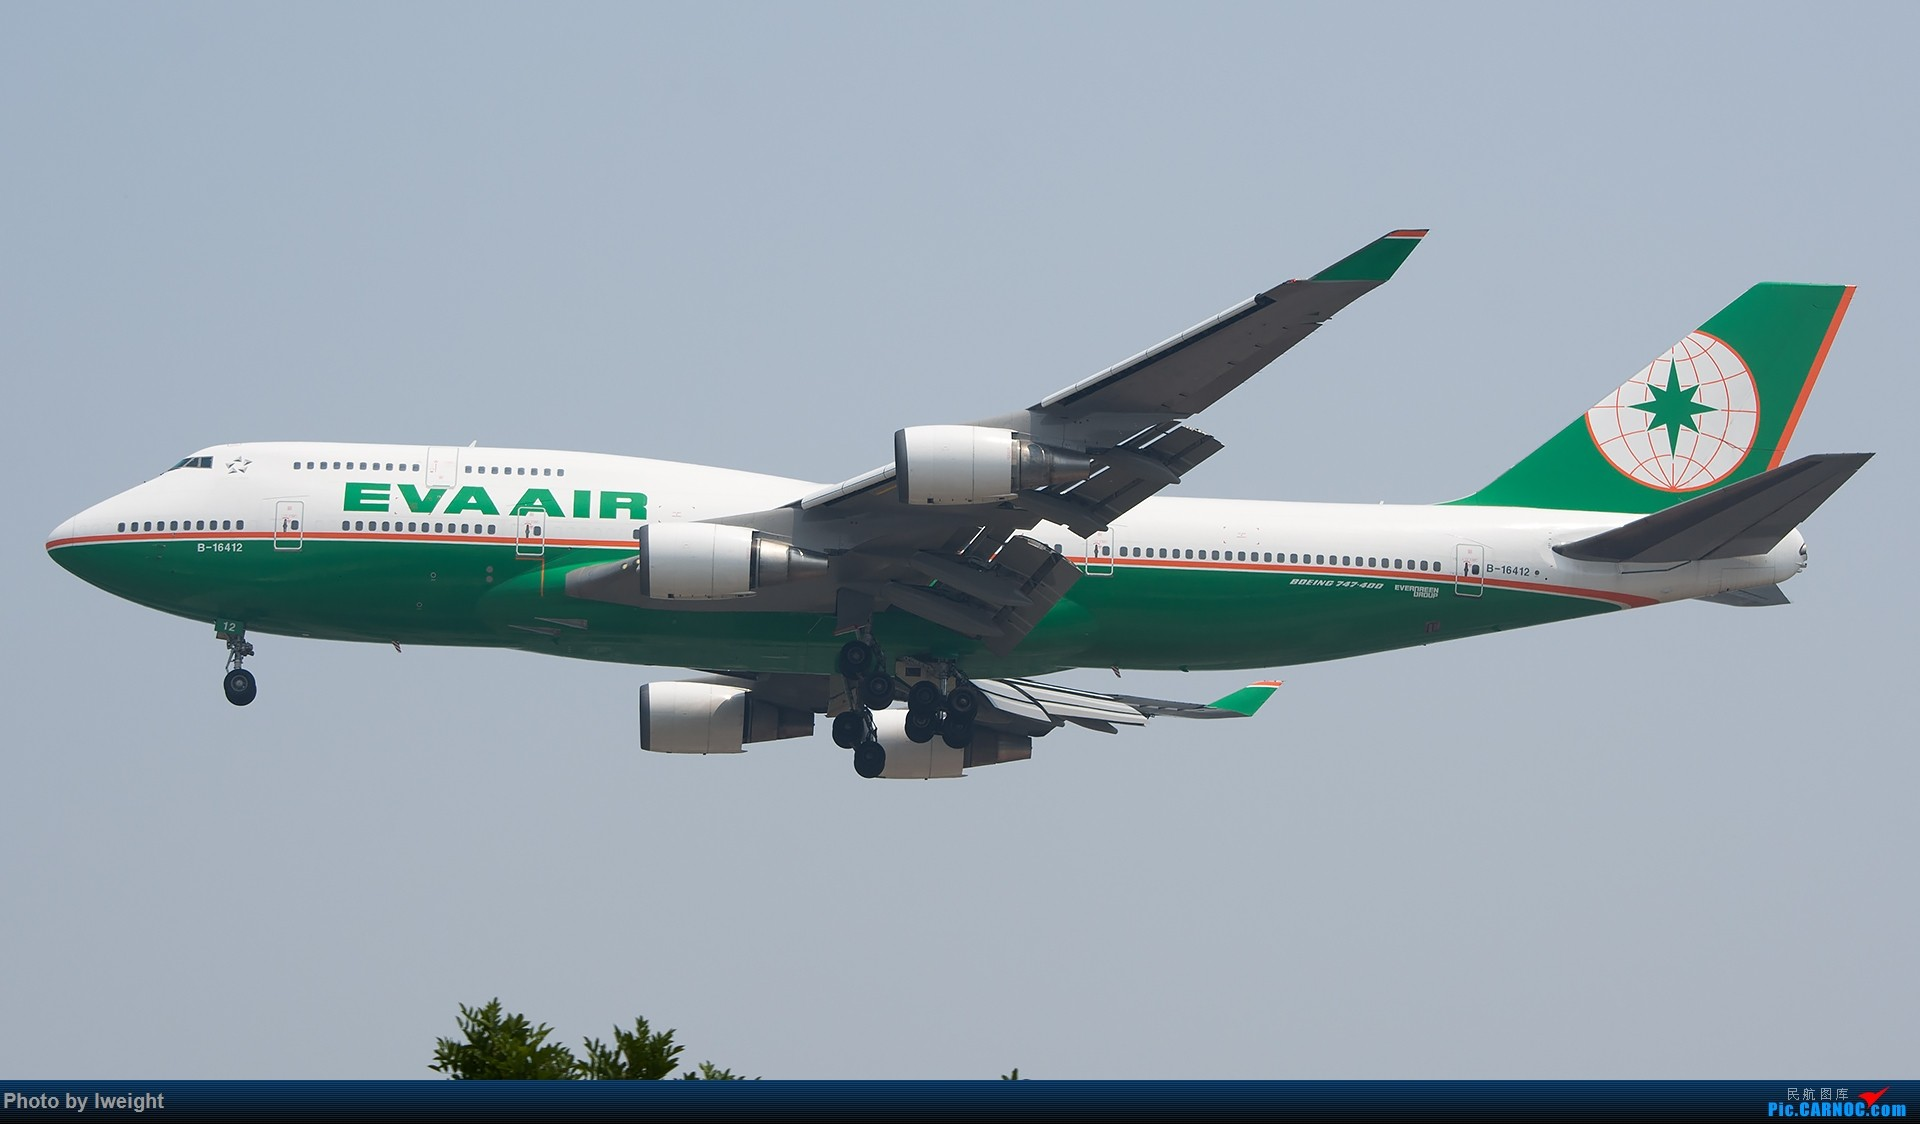 Re:[原创]周末帝都霾天拍机,凑合看看吧【2015-5-23】 BOEING 747-400 B-16412 中国北京首都国际机场